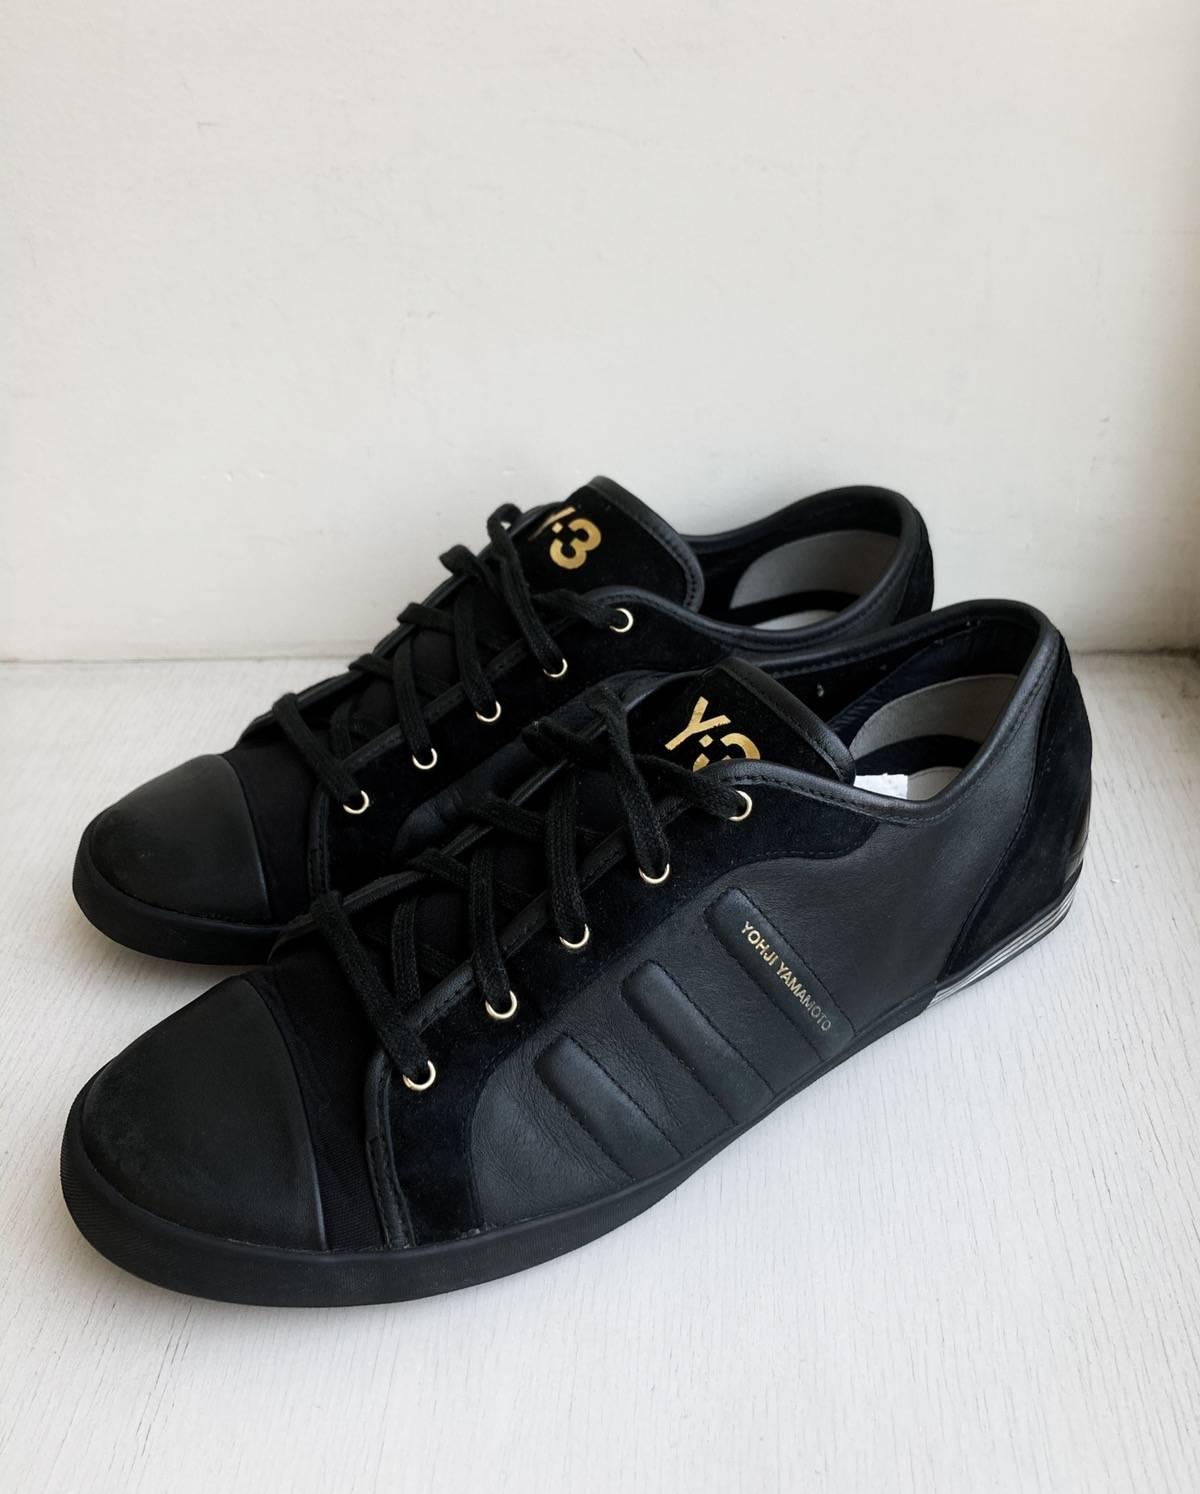 Cubeta descanso Asalto  Yohji Yamamoto Adidas Y3 Yohji Yamamoto Sample Sneakers | Grailed